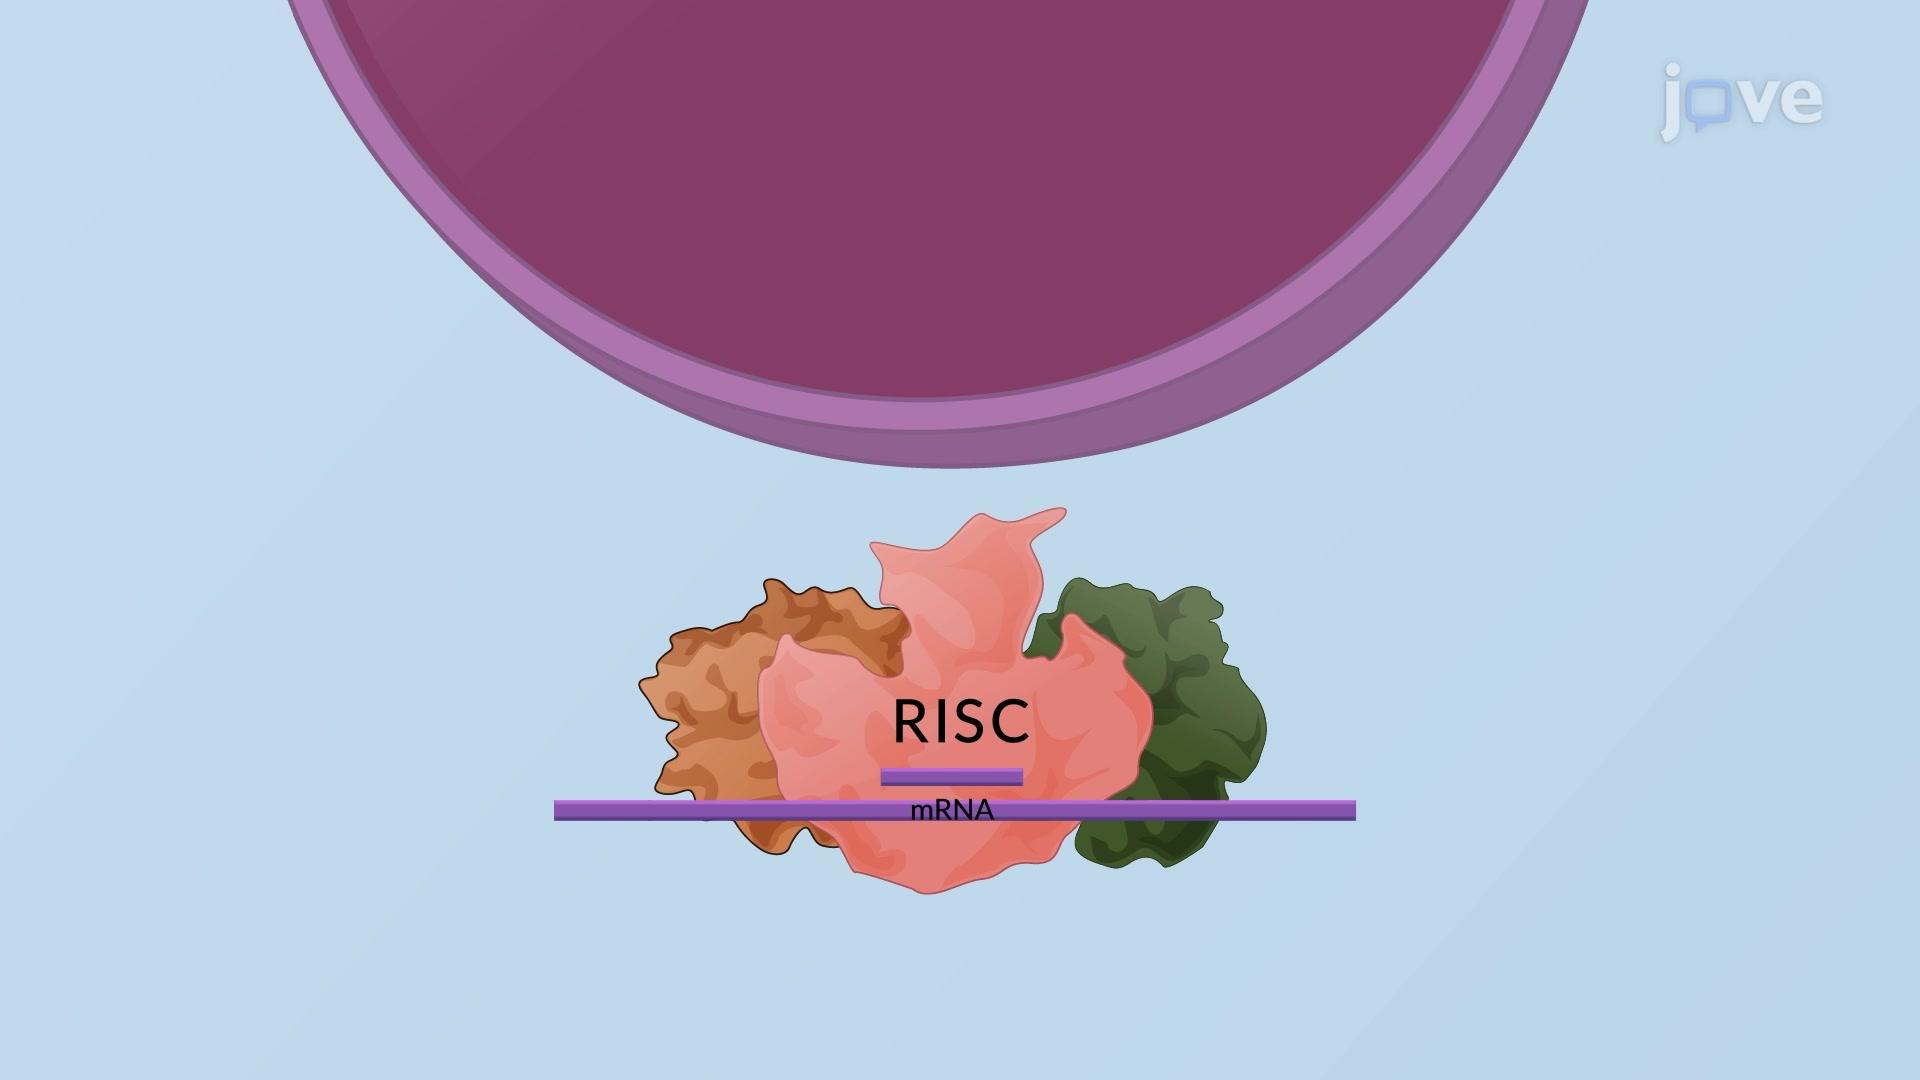 Experimental RNAi